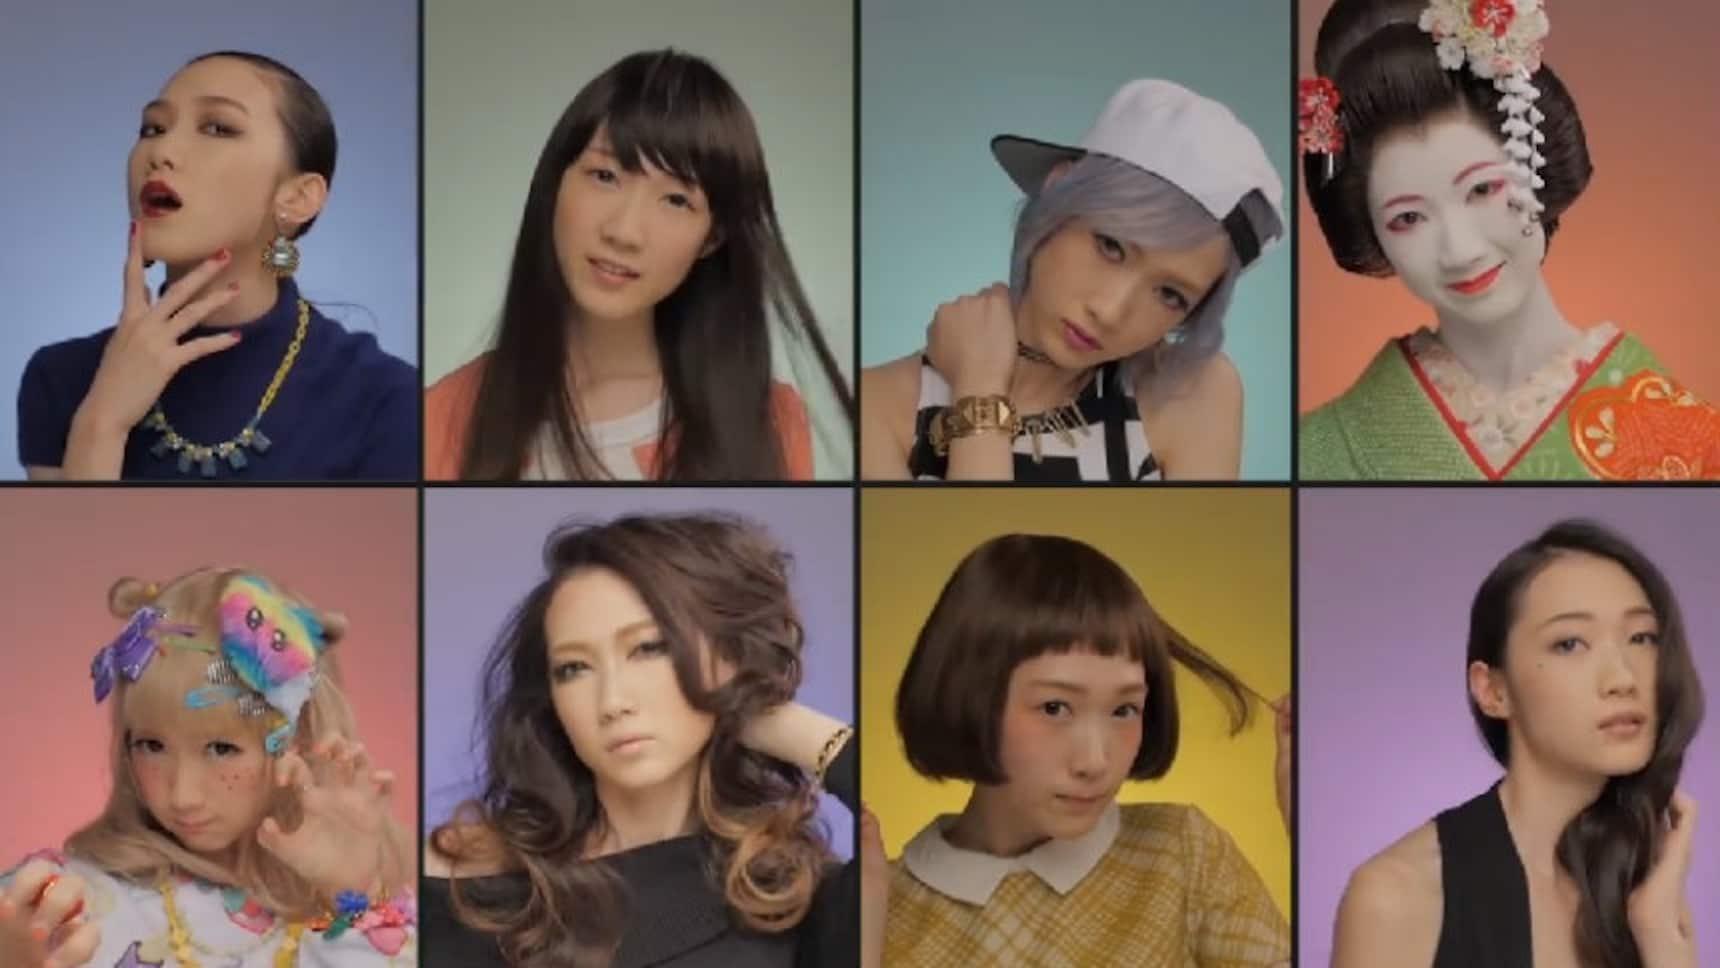 8 Models, 1 Secret